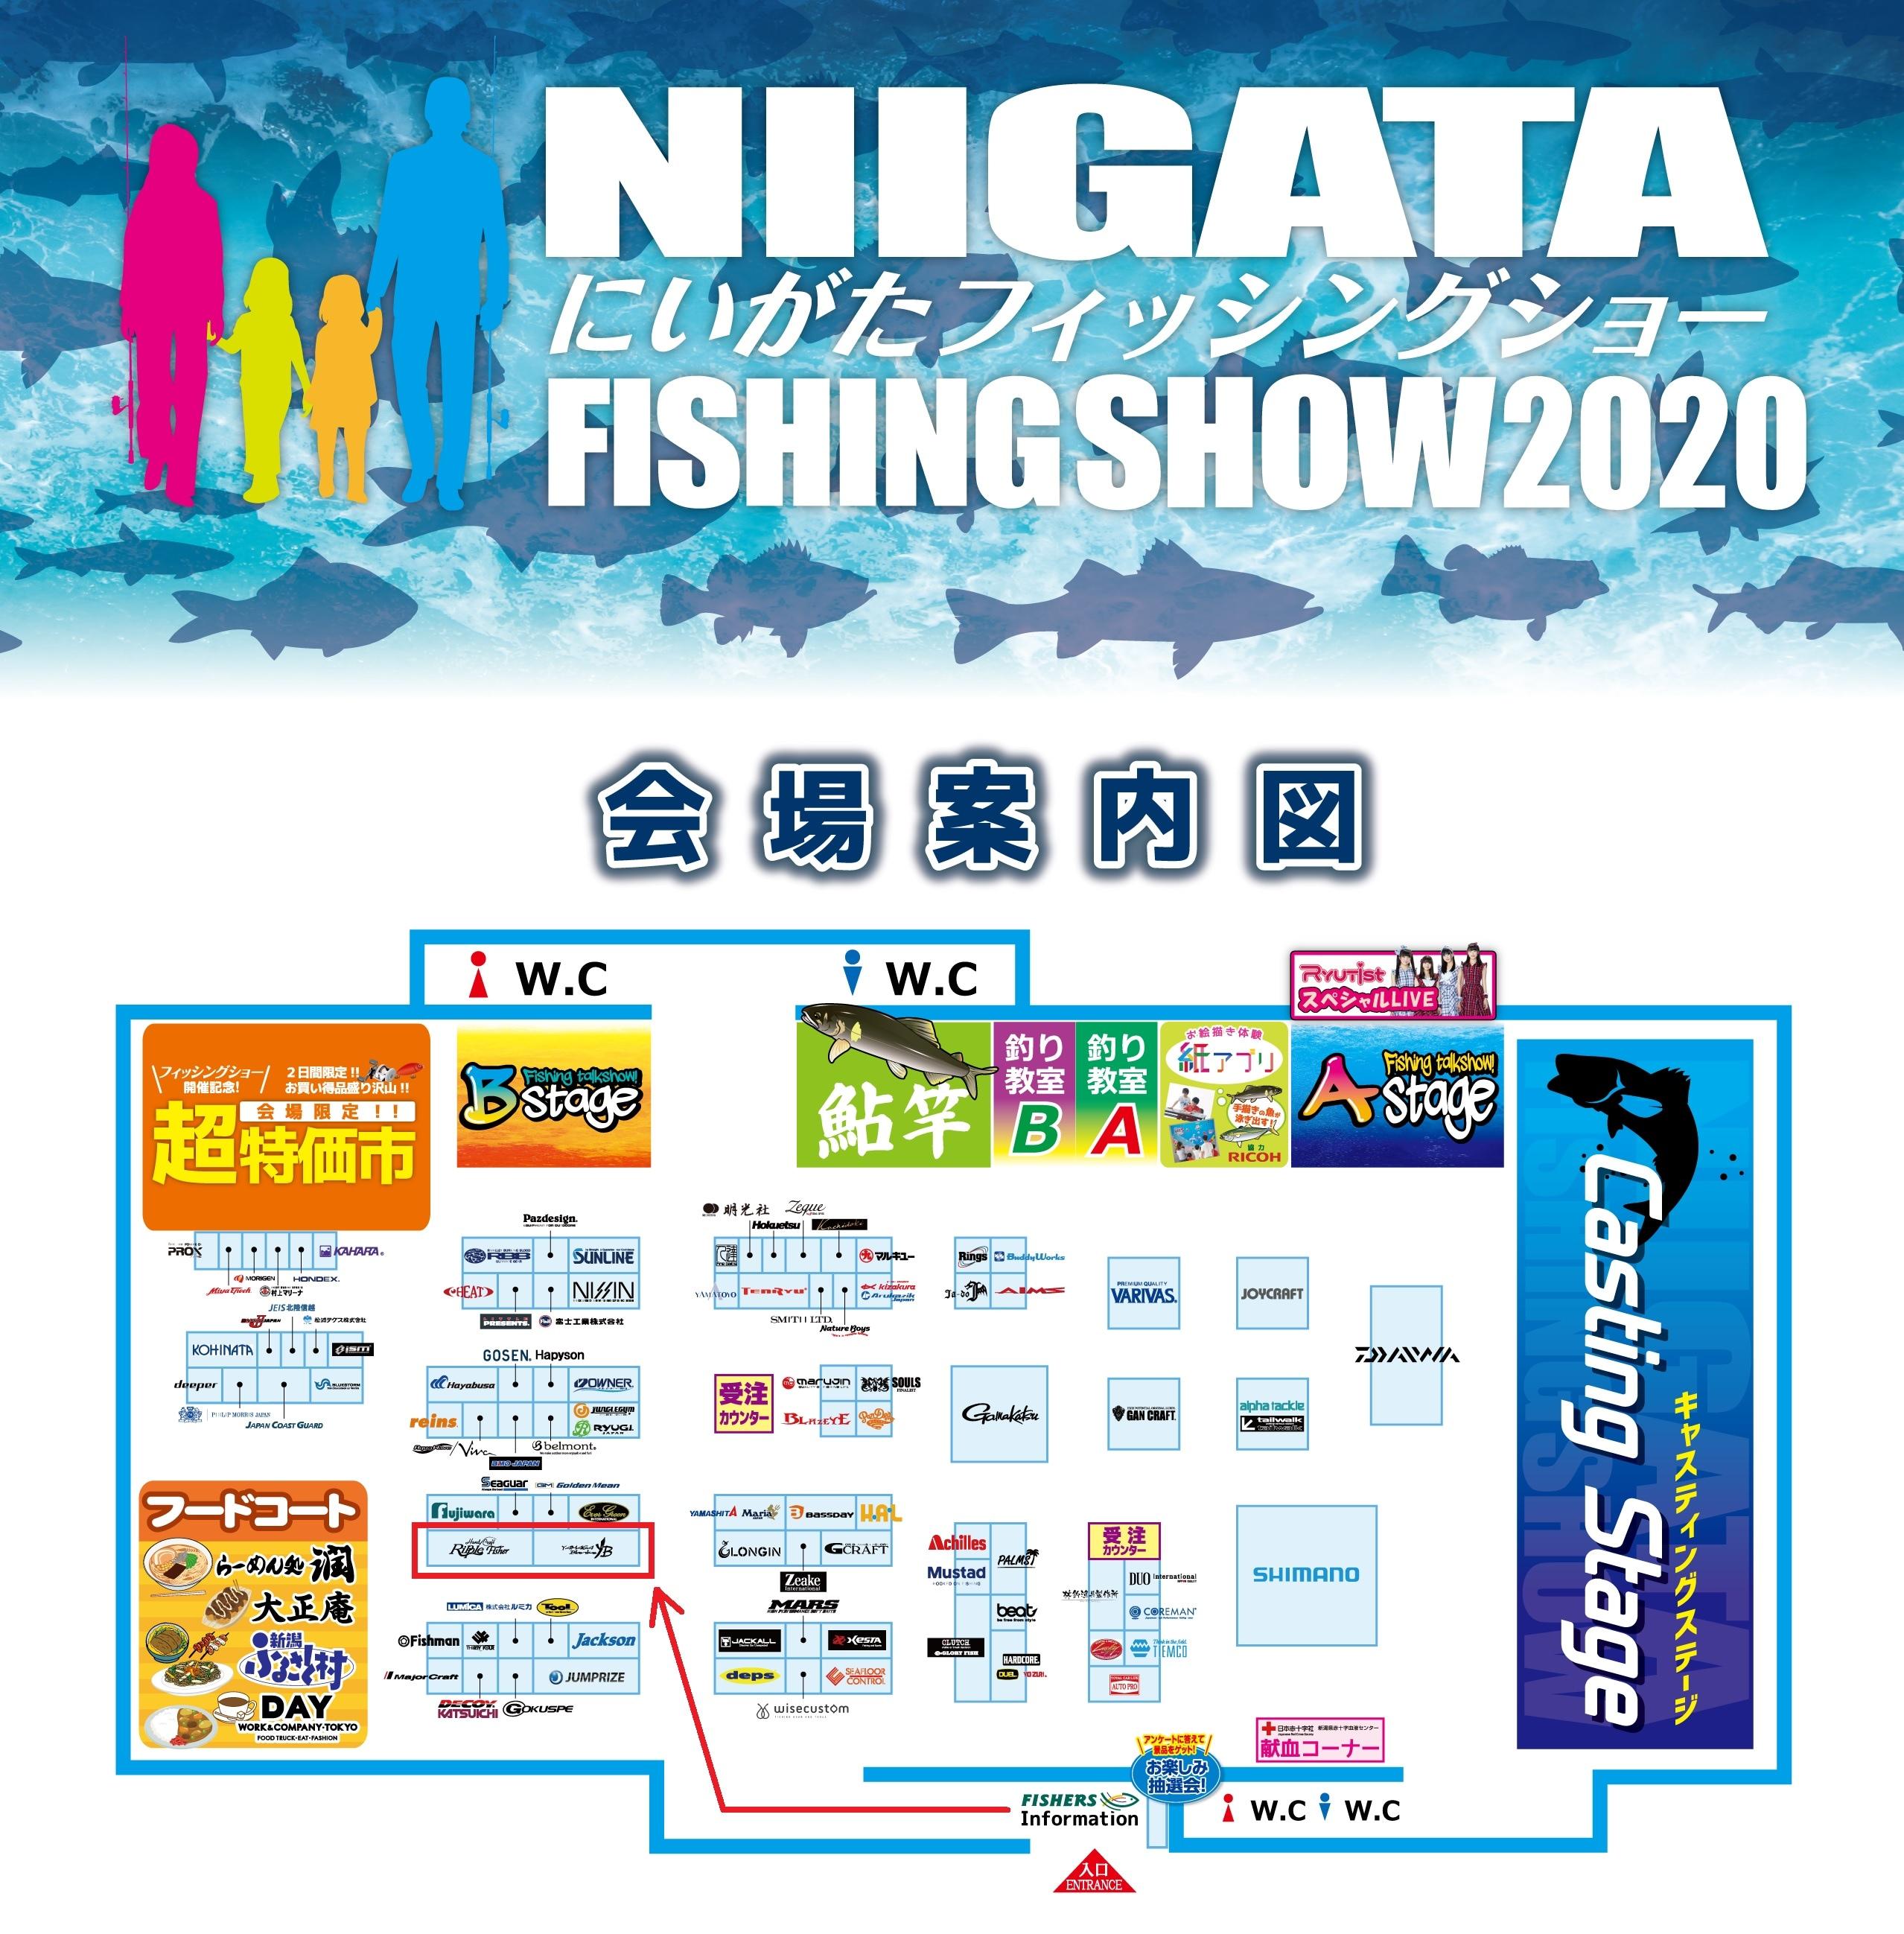 NIIGATA_FS2020_MAP